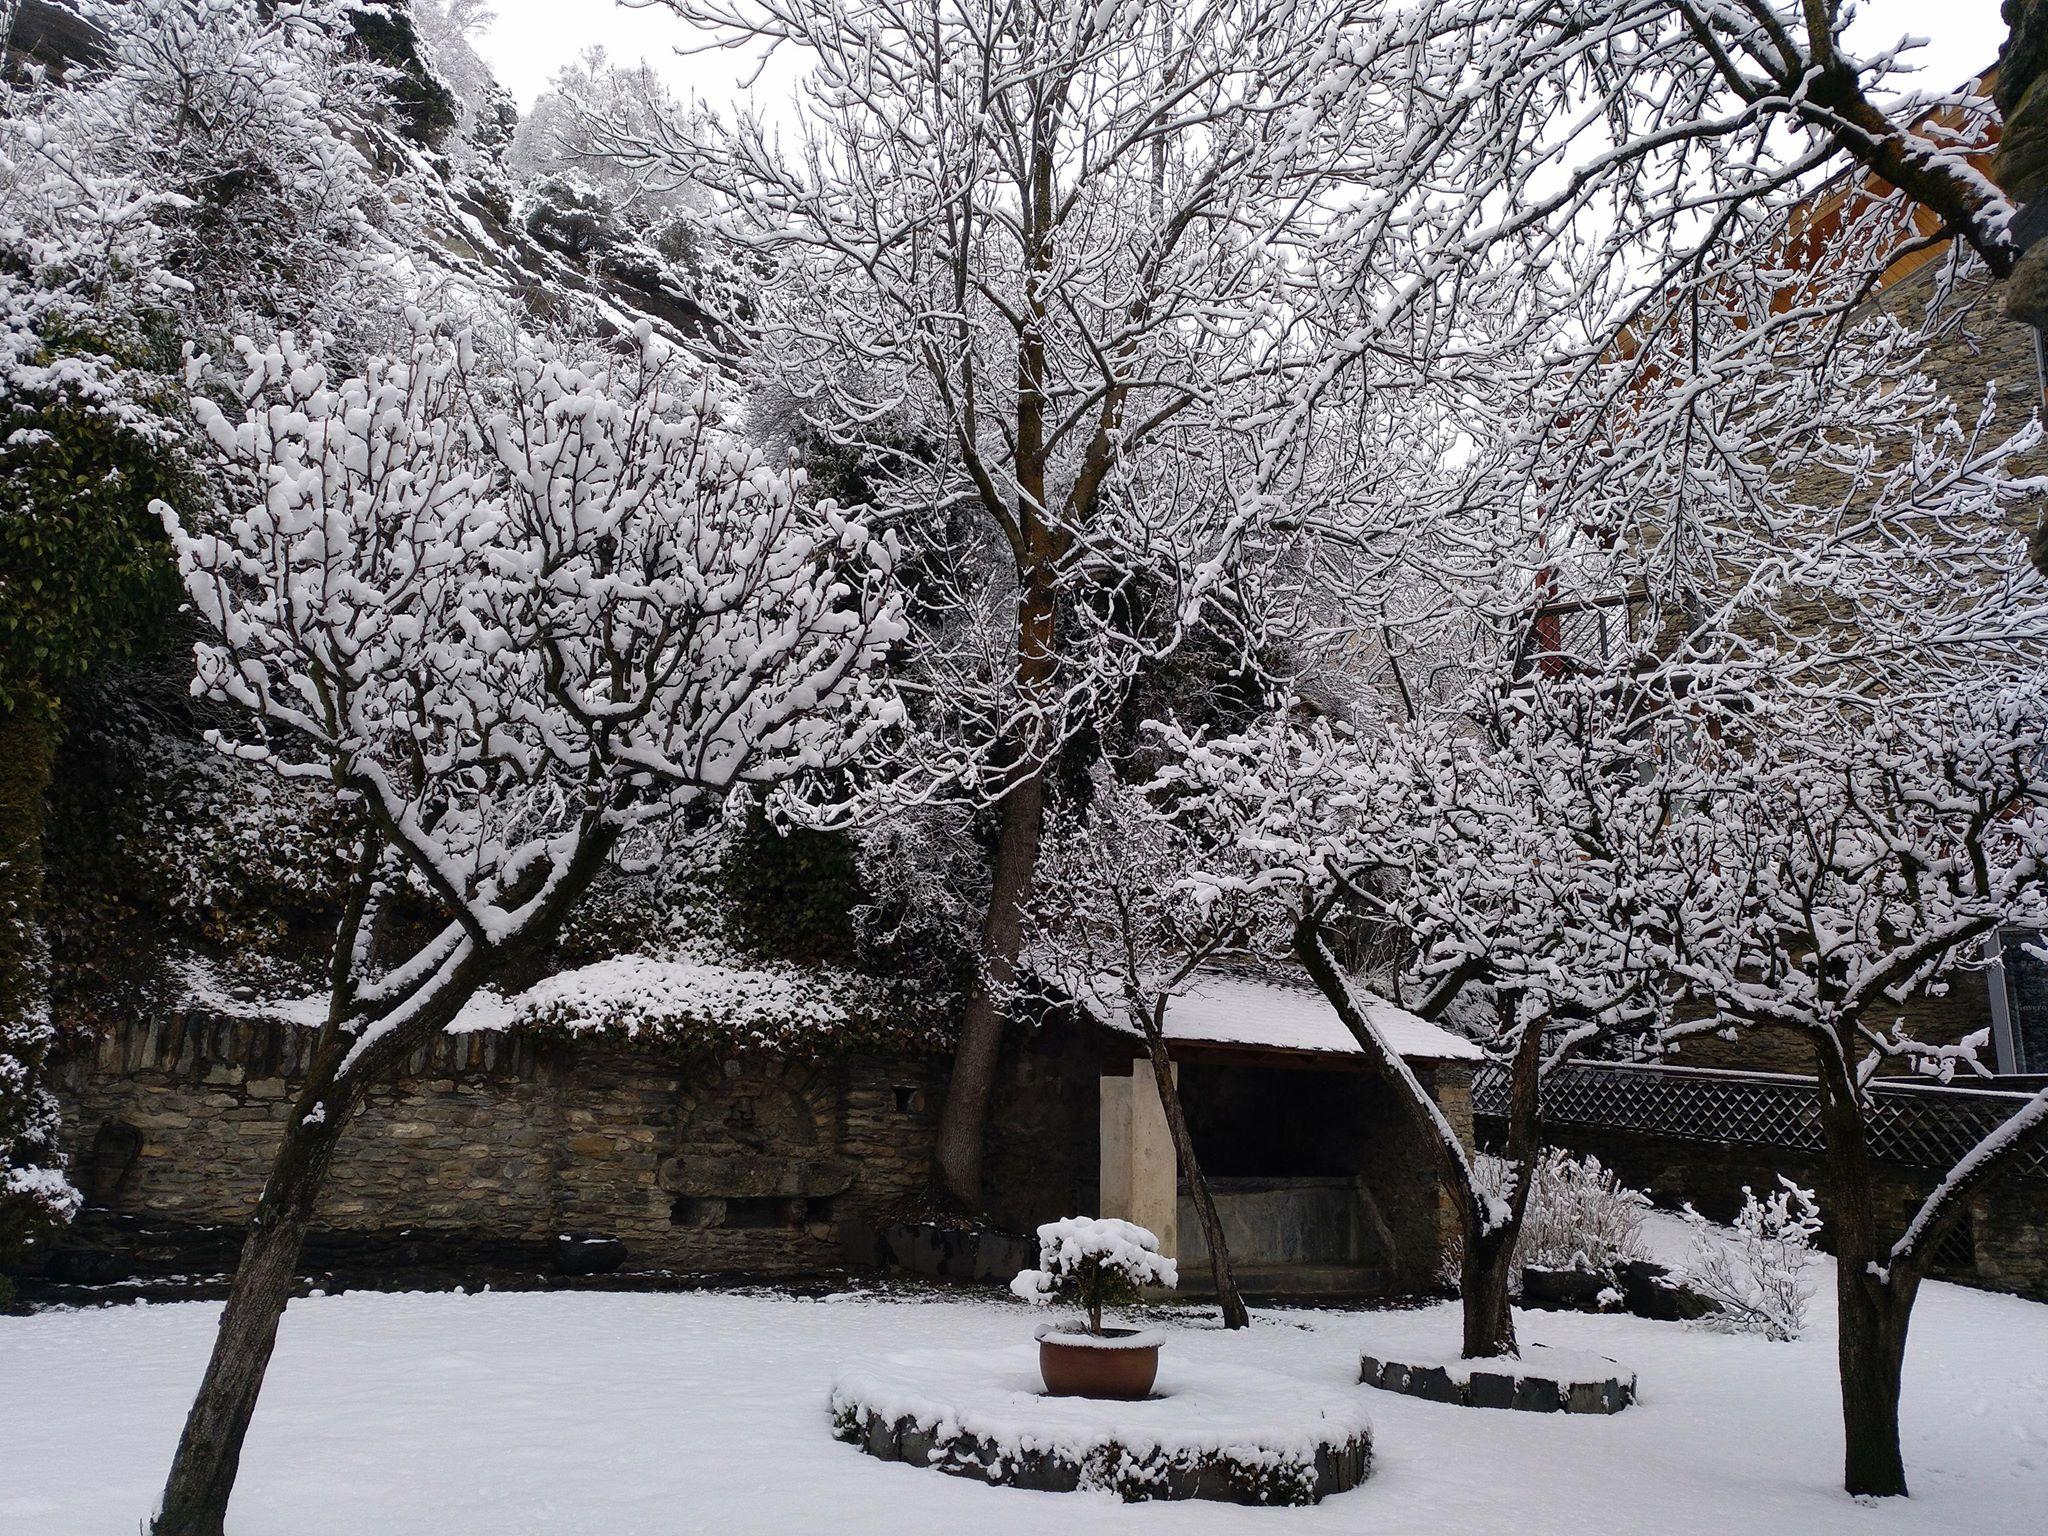 Ordino jardins casa museu Areny Plandolit - Oli Tb